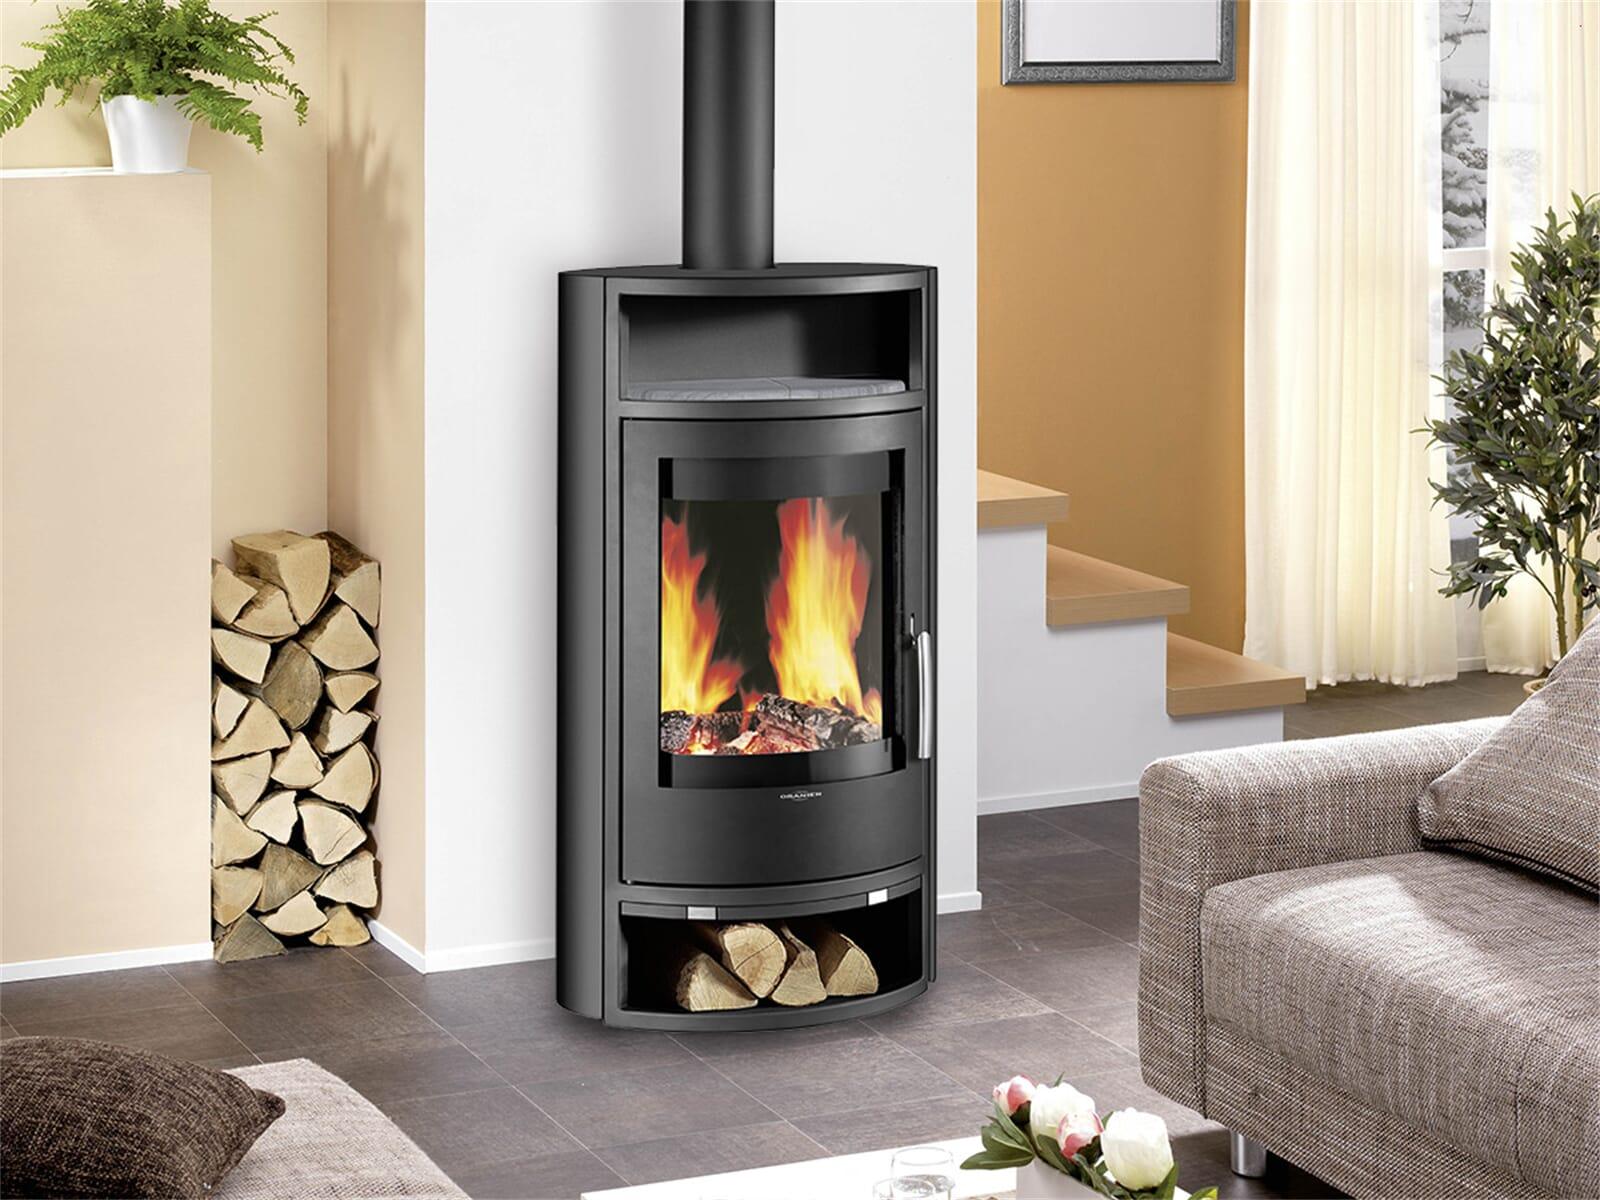 oranier polar 6 5446 11 kaminofen stahl schwarz. Black Bedroom Furniture Sets. Home Design Ideas